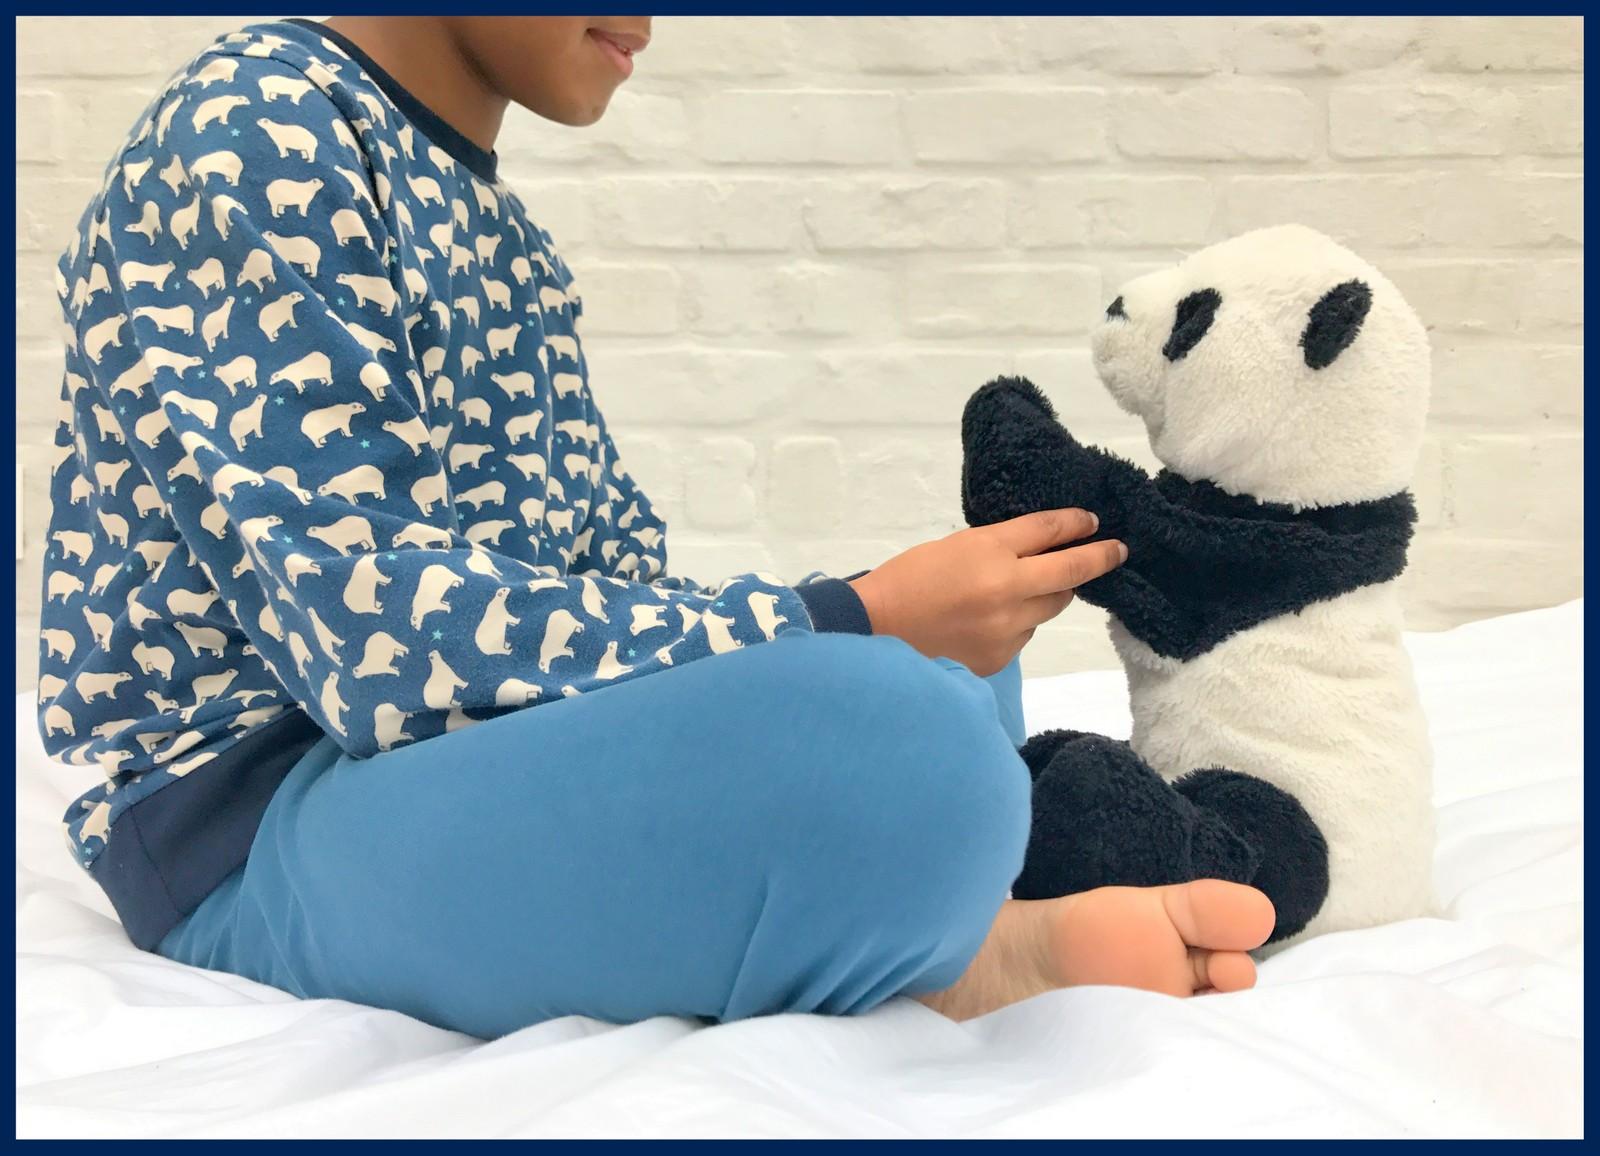 ijsbeer pijama (sitting)